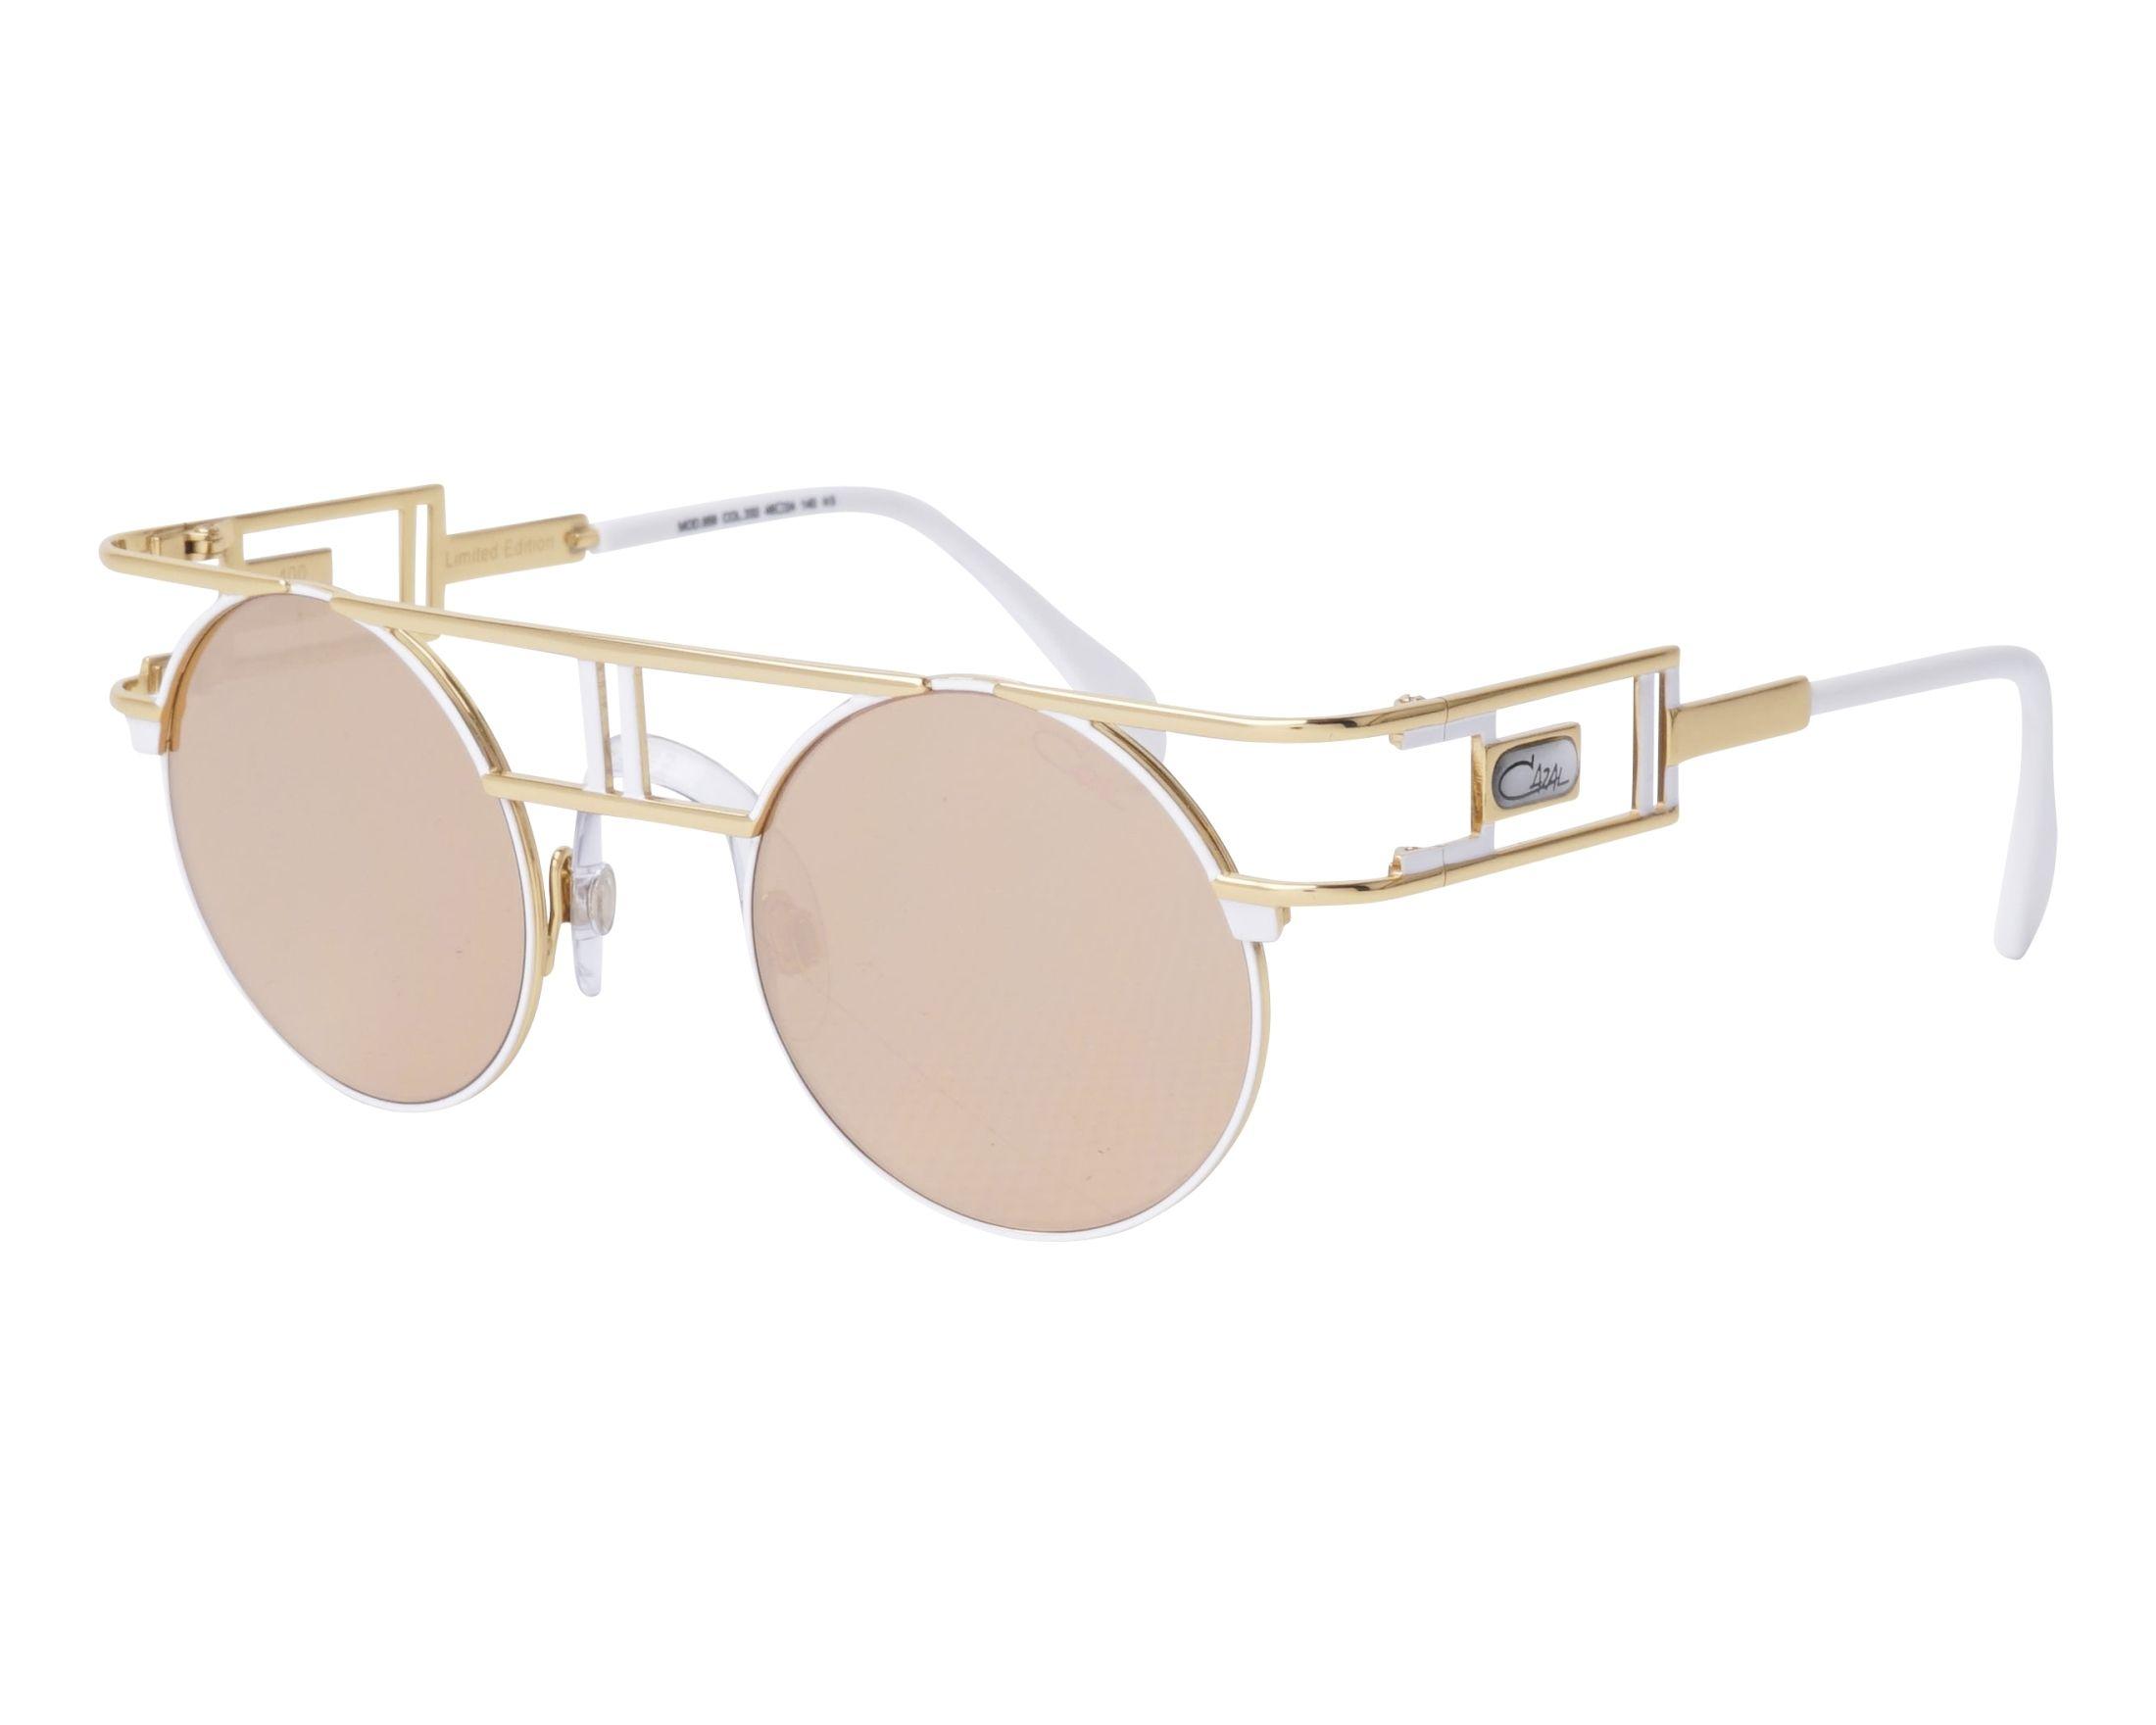 cbb1d111eda Sunglasses Cazal 958 332 - White Gold profile view